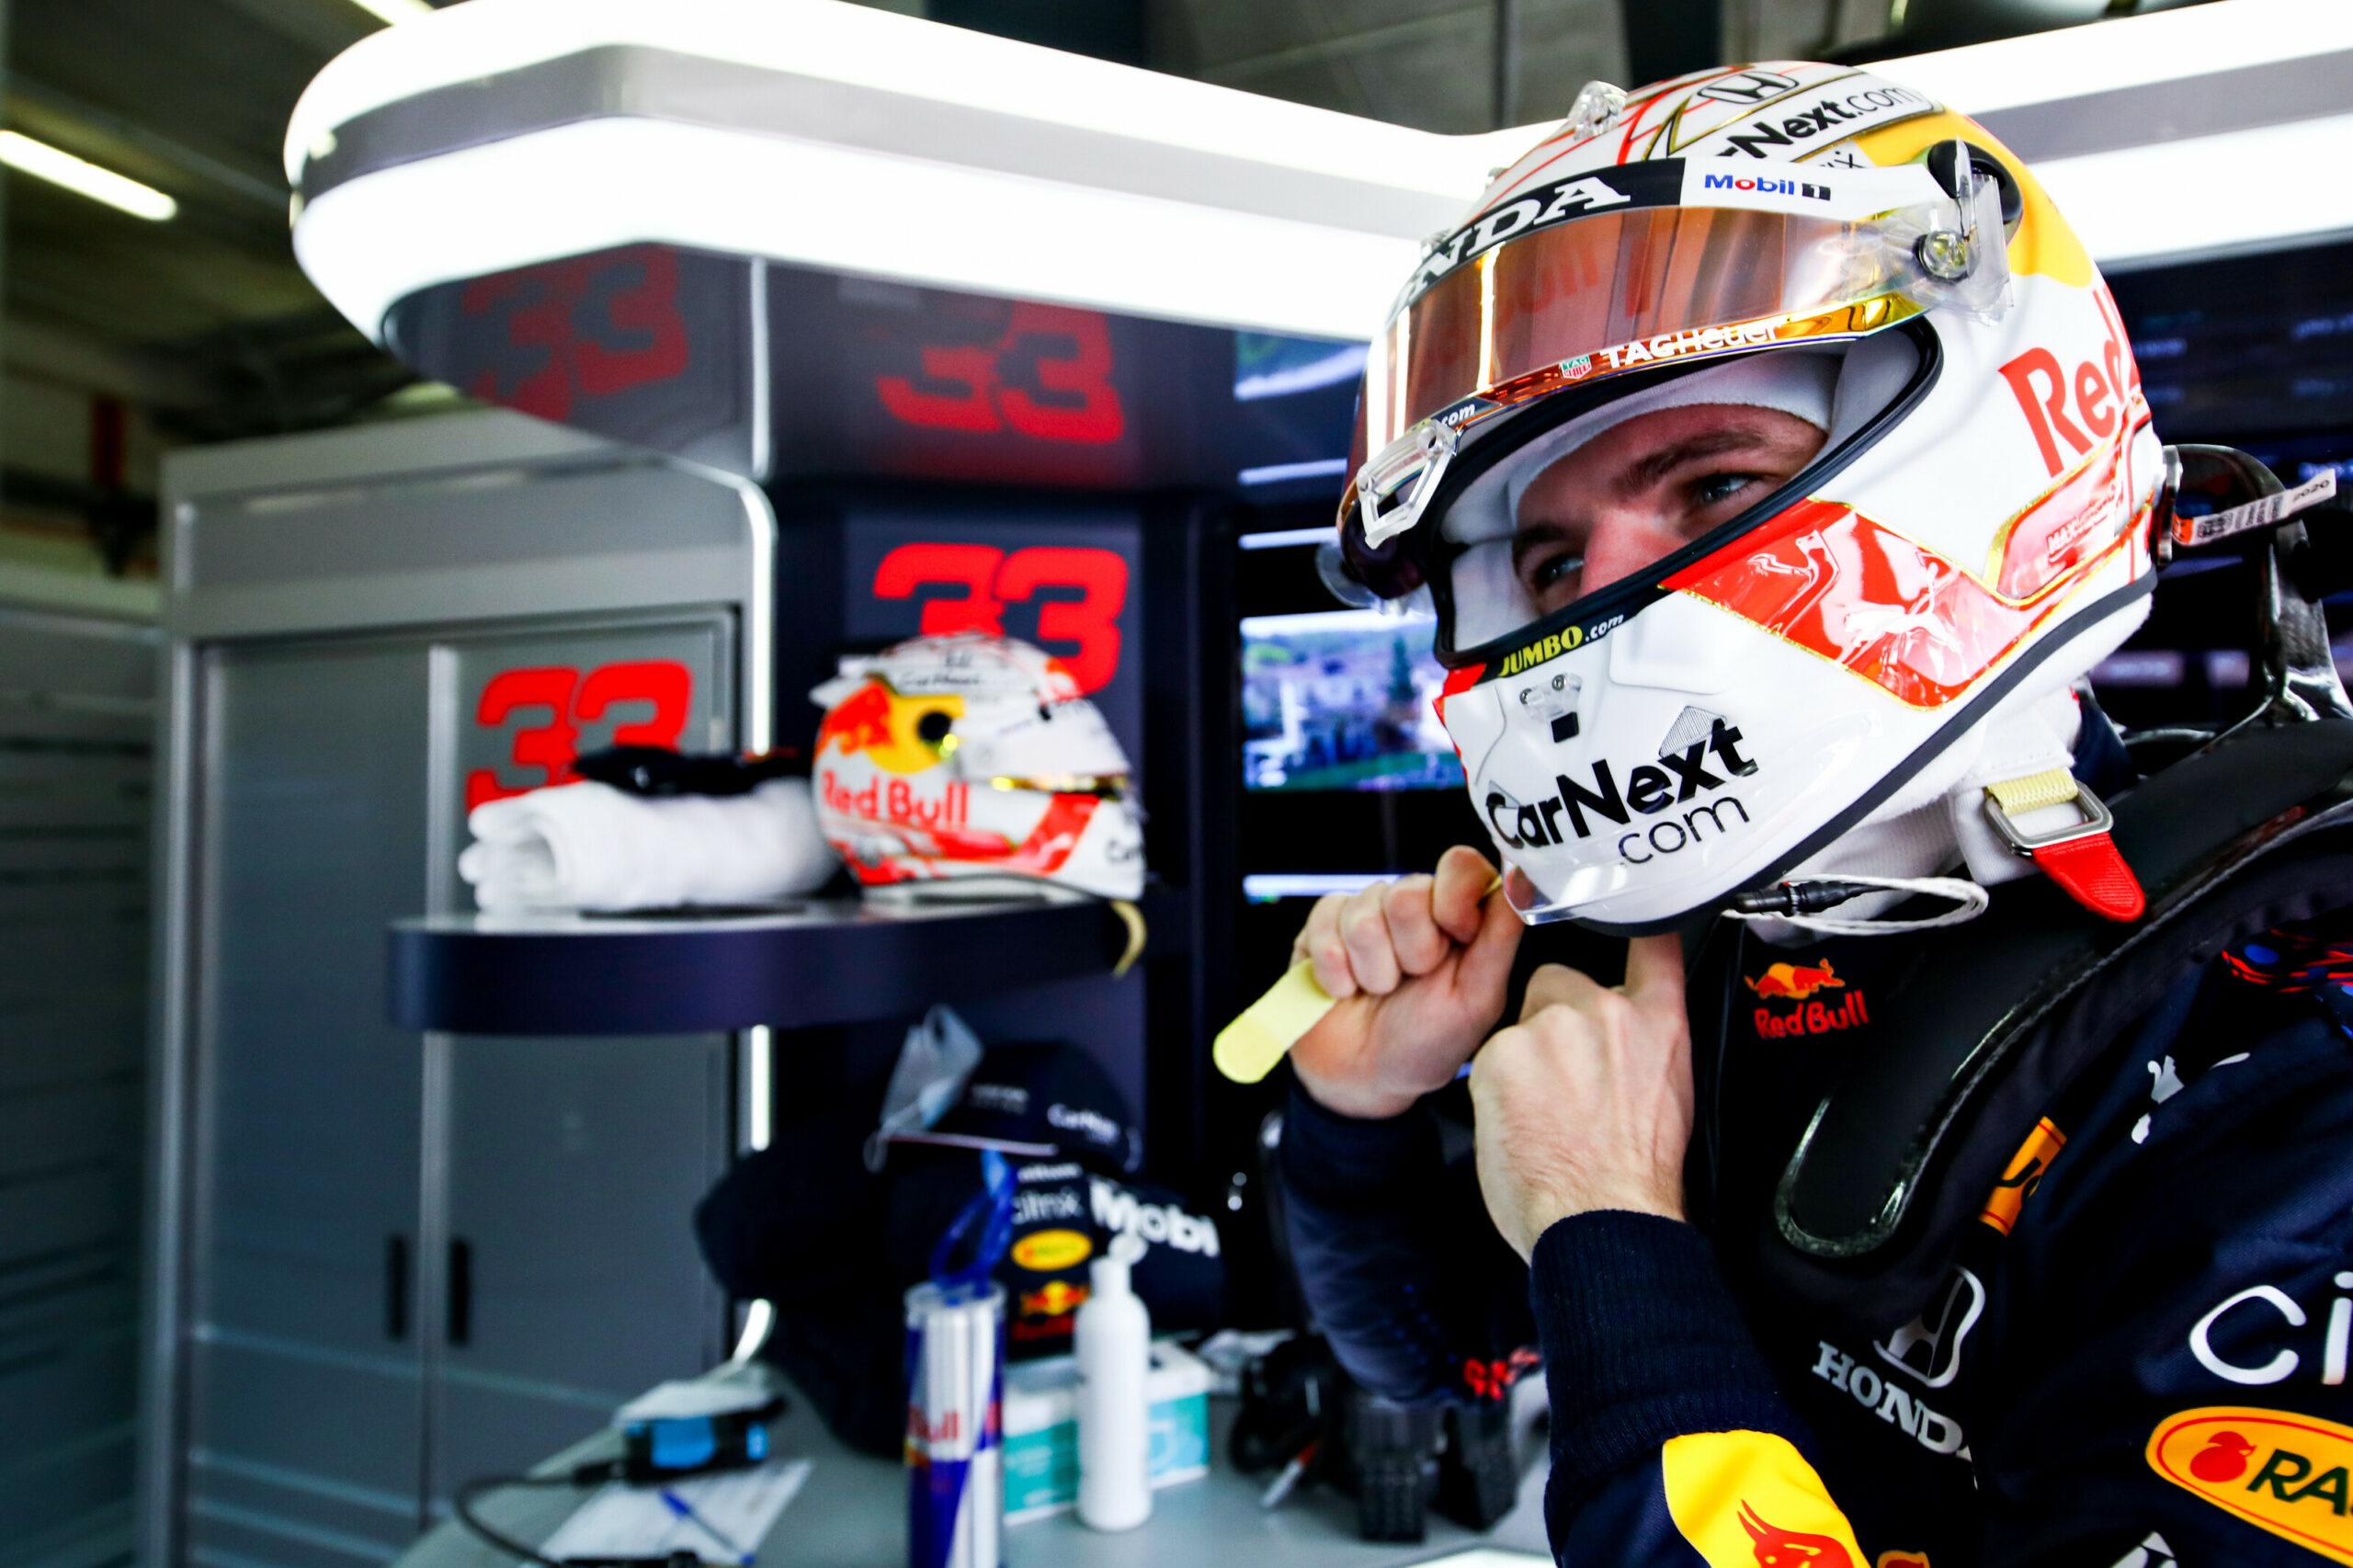 F1 - Max Verstappen à pied ce vendredi après-midi à Imola